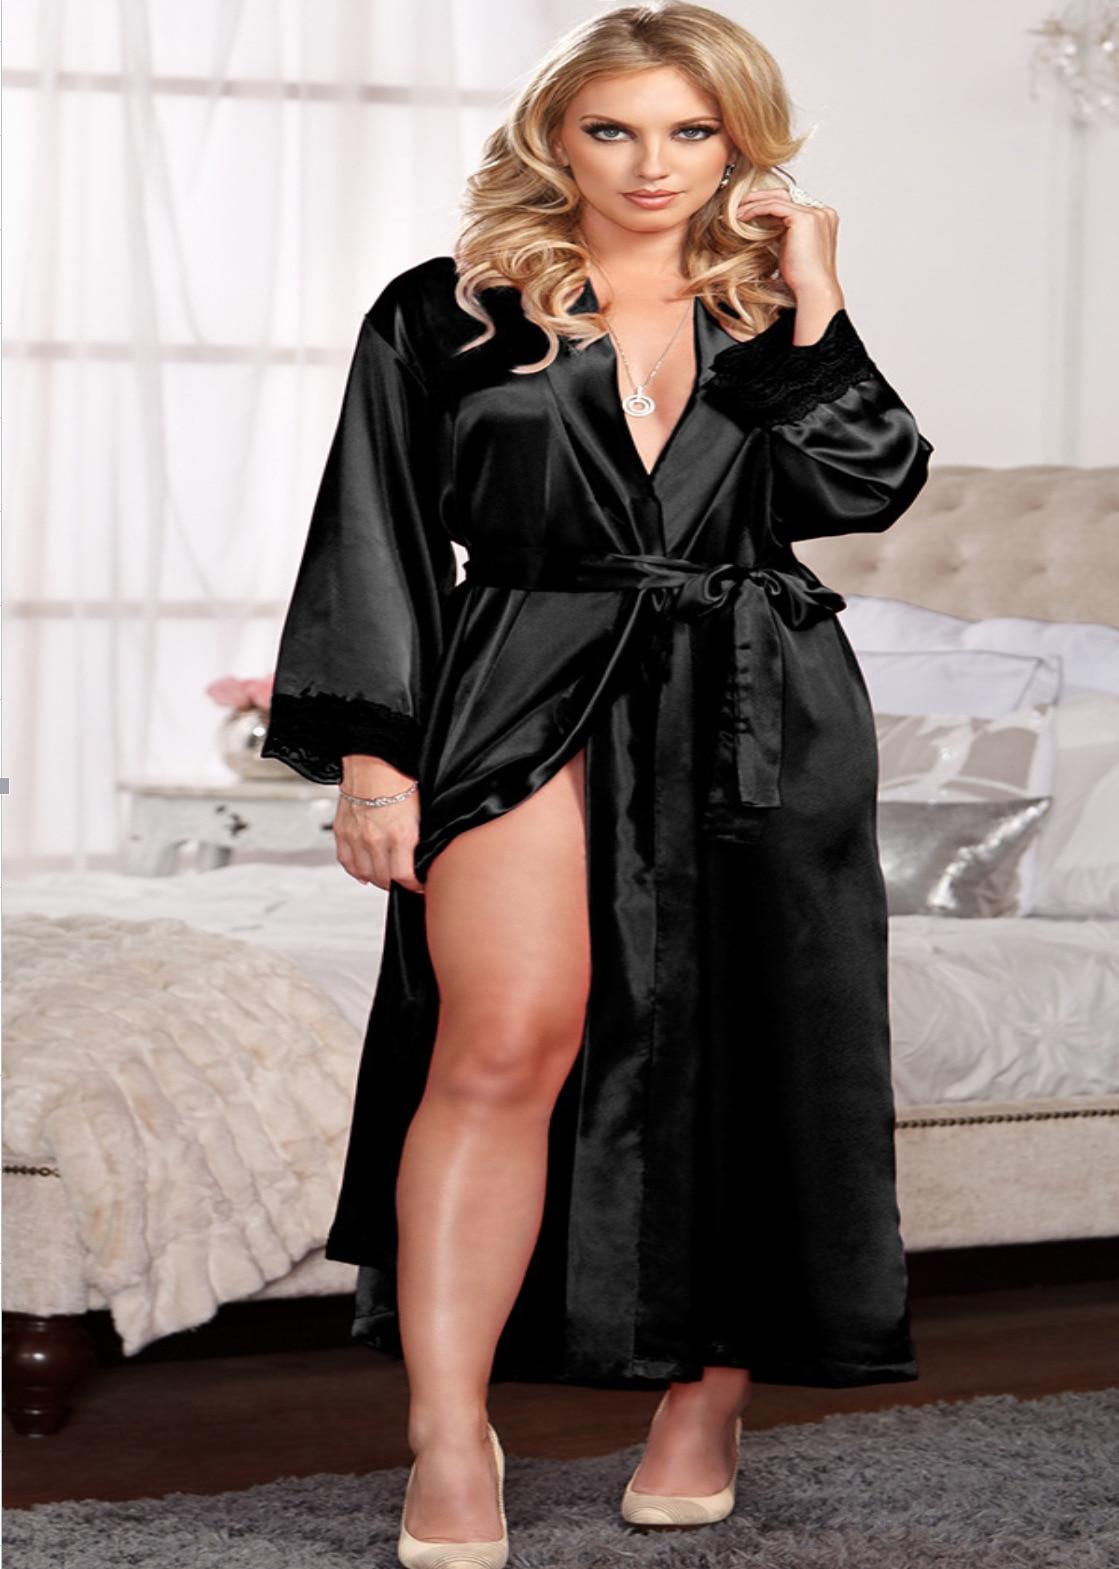 Hot Selling Pajamas Imitated Silk Fabric Robe Bathrobe Large Size Bathrobe Nightgown Supply Of Goods Europe And America 061